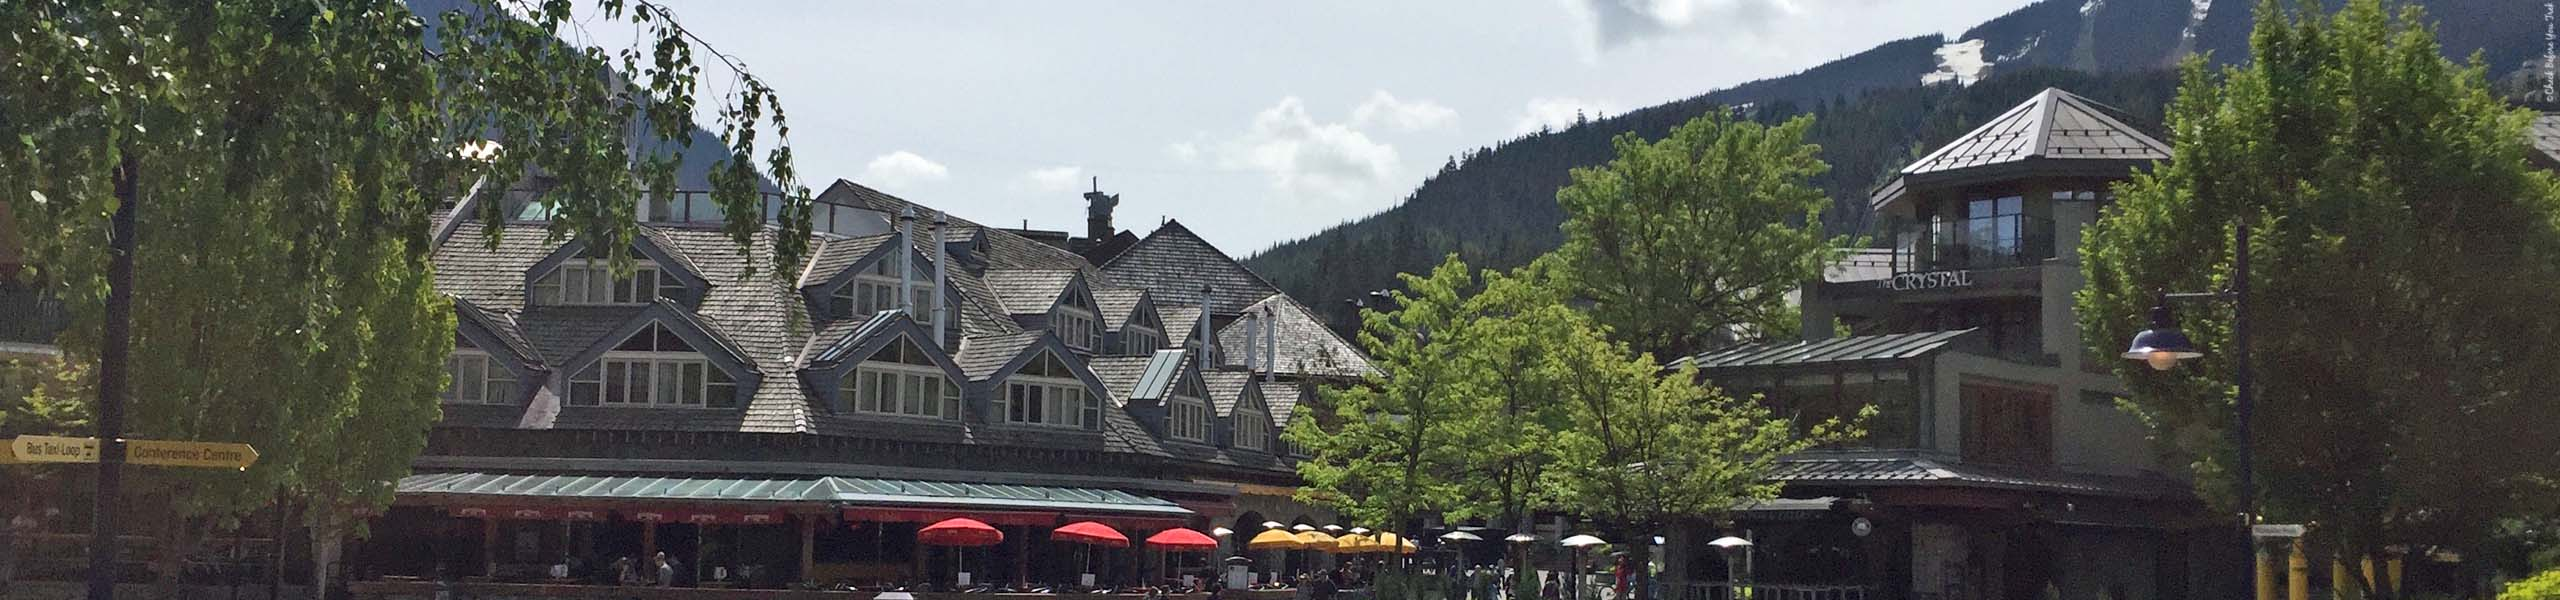 Featured Photo - Whistler Village, Whistler, British Columbia, Canada